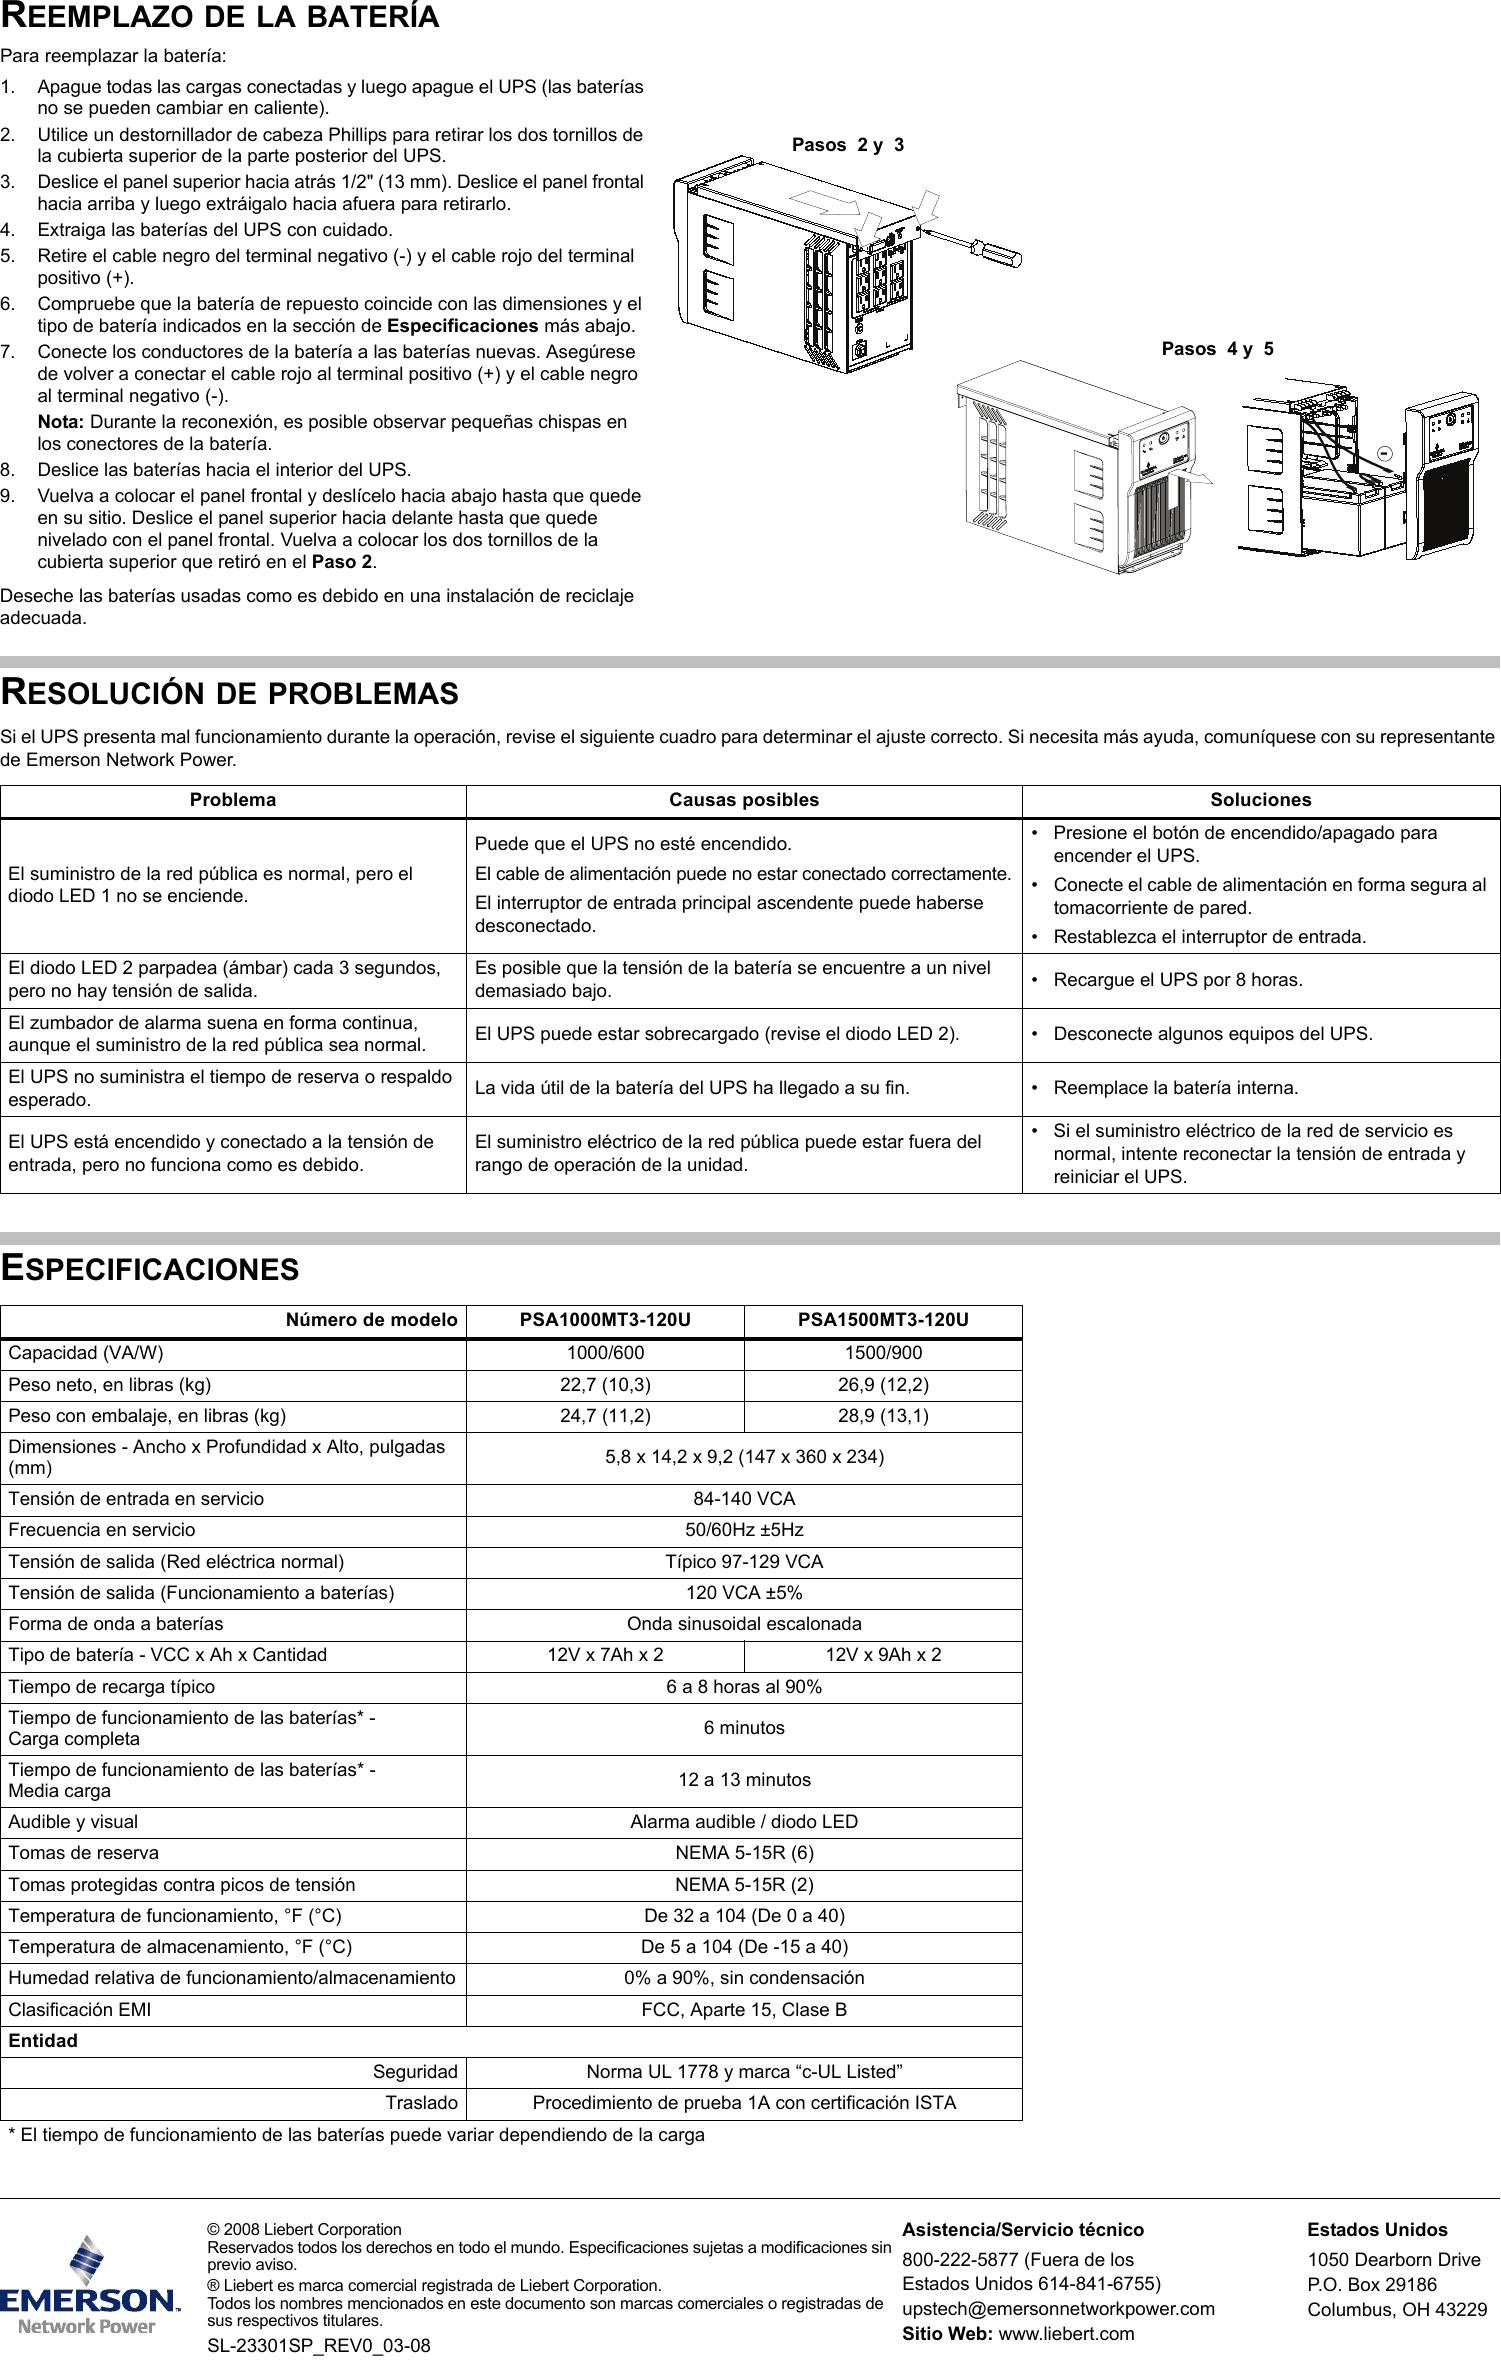 psa 2 3 manual guide professional user manual ebooks u2022 rh justusermanual today PSA 3 Brooklyn Prostate-Specific AG Serum Test